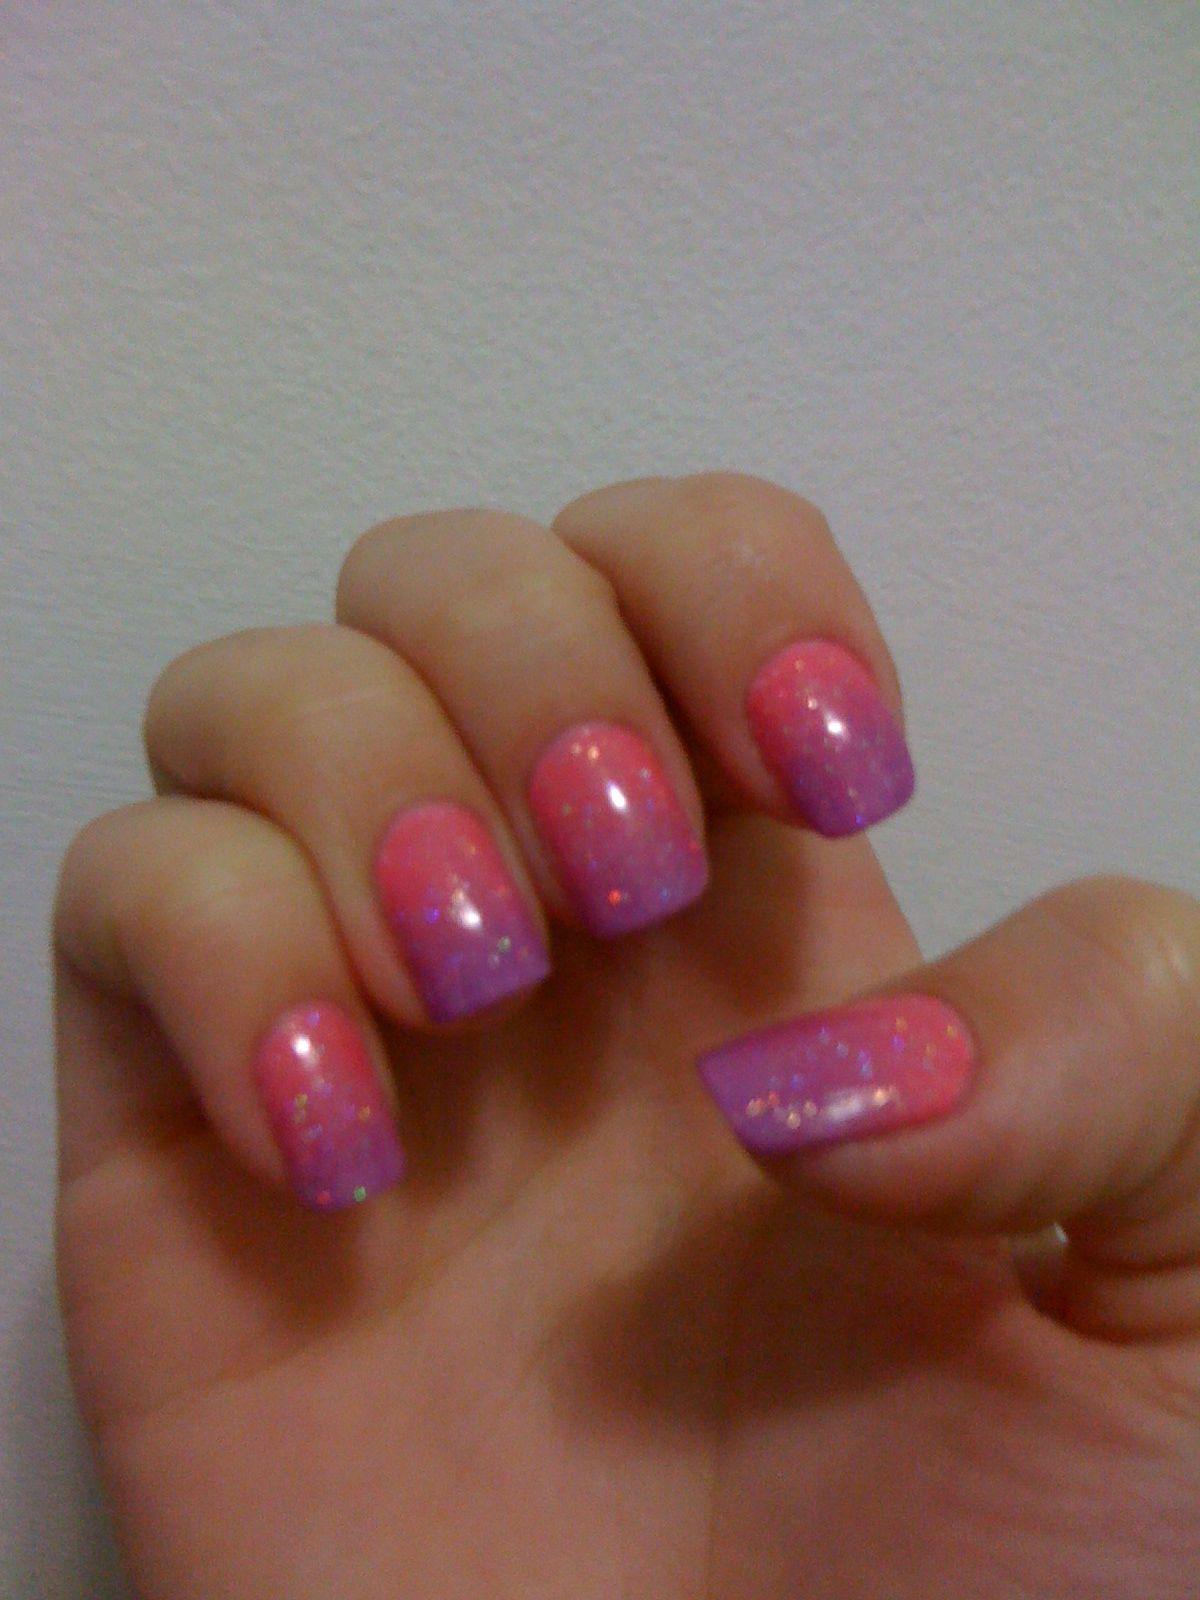 Sunset nail art | Nail art, Sunset nails, Nails